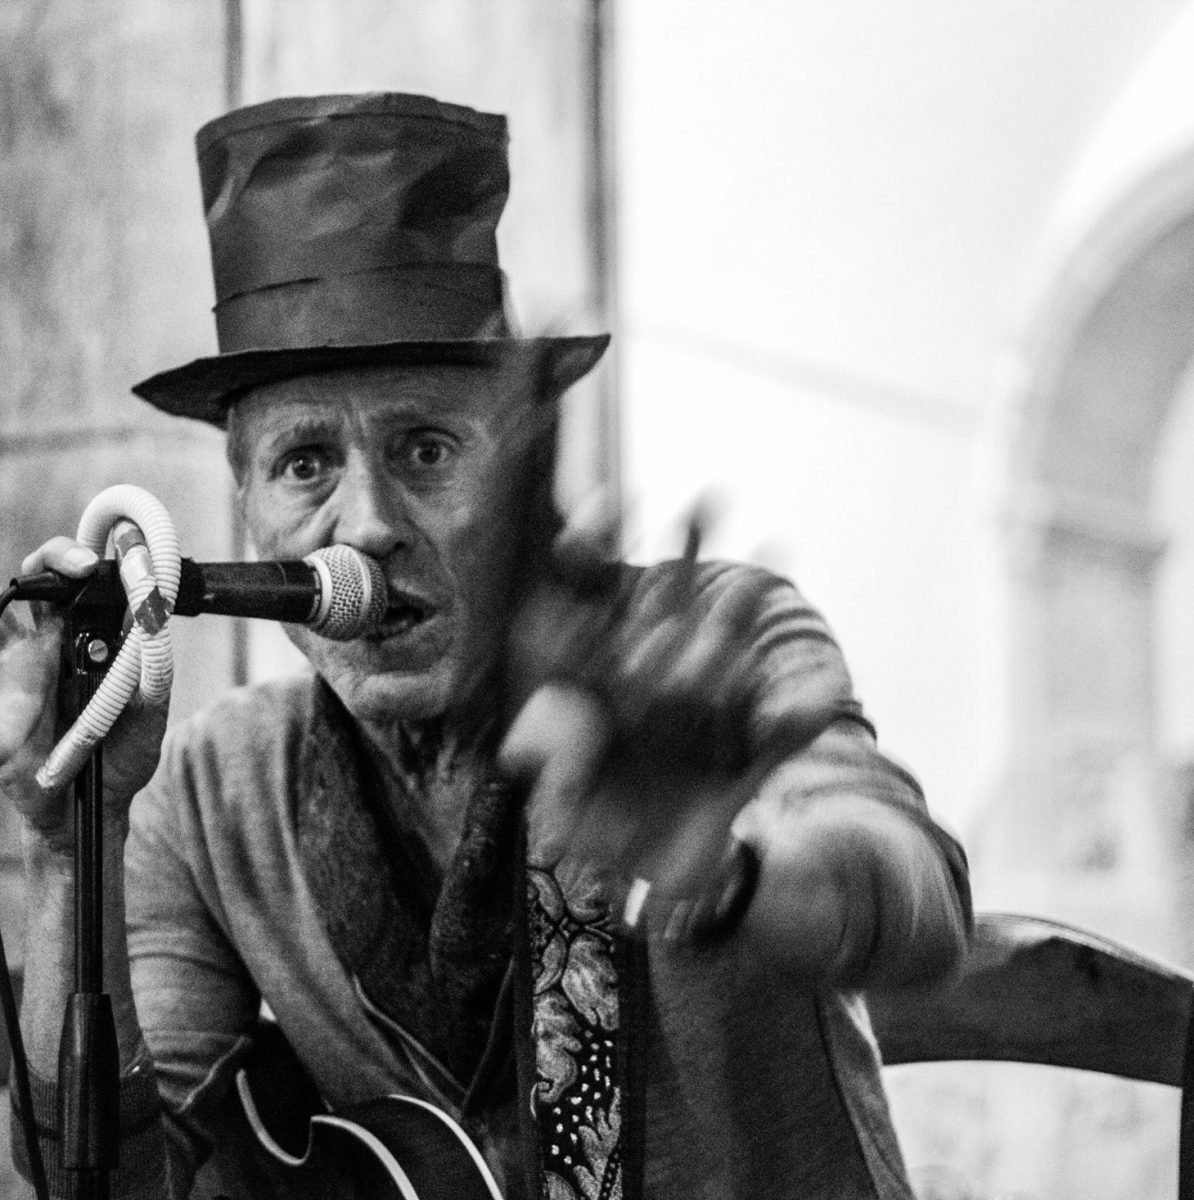 Abetone Friday Night - Gavino Riva - Abetone Music Bar - Sassari - 10 gennaio 2020 - eventi - 2020 - Sa Scena Sarda